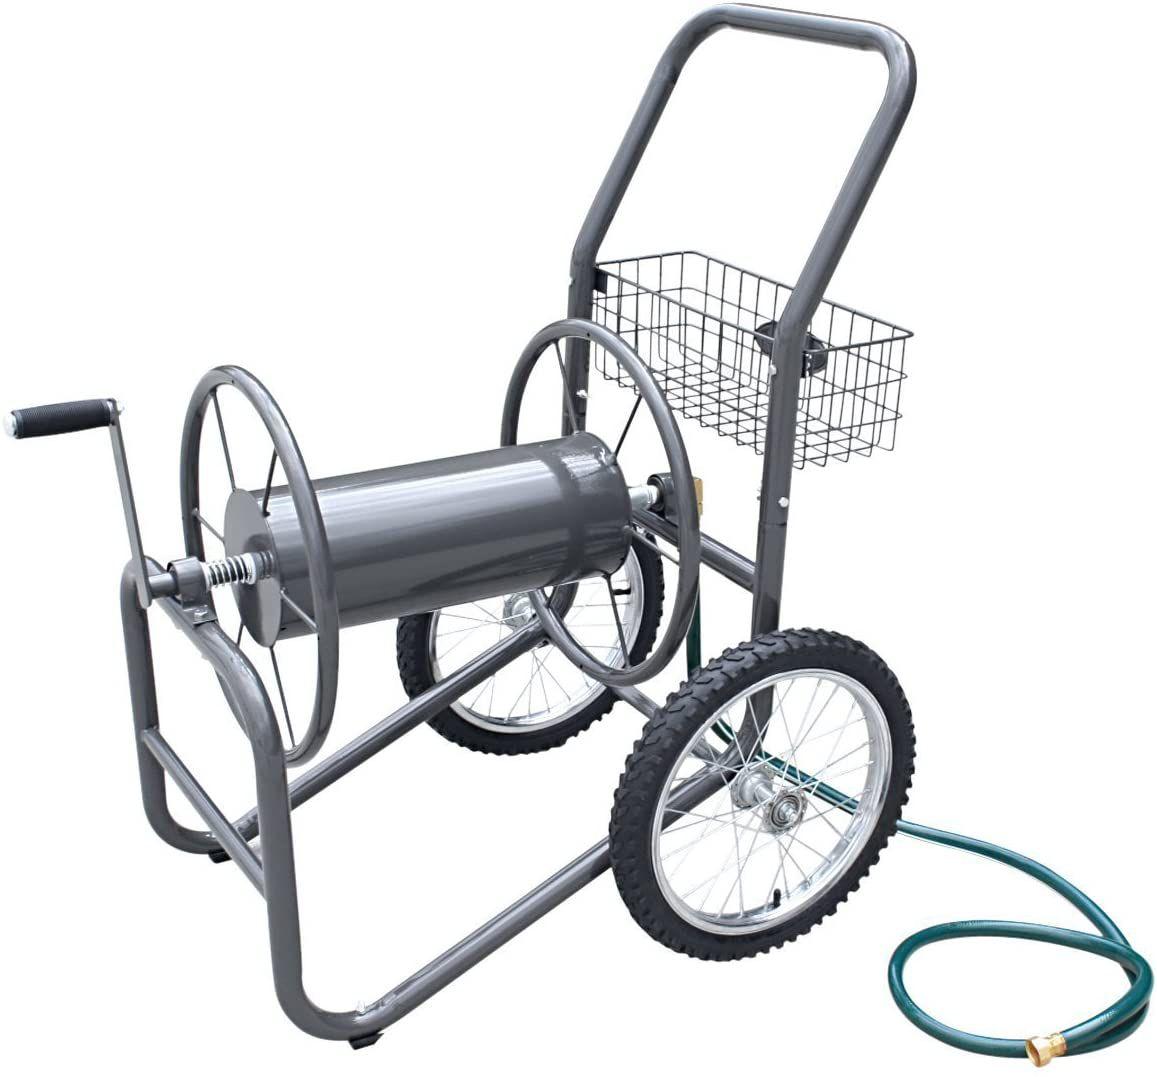 Liberty Garden 300 ft. 2-Wheel Industrial Hose Cart